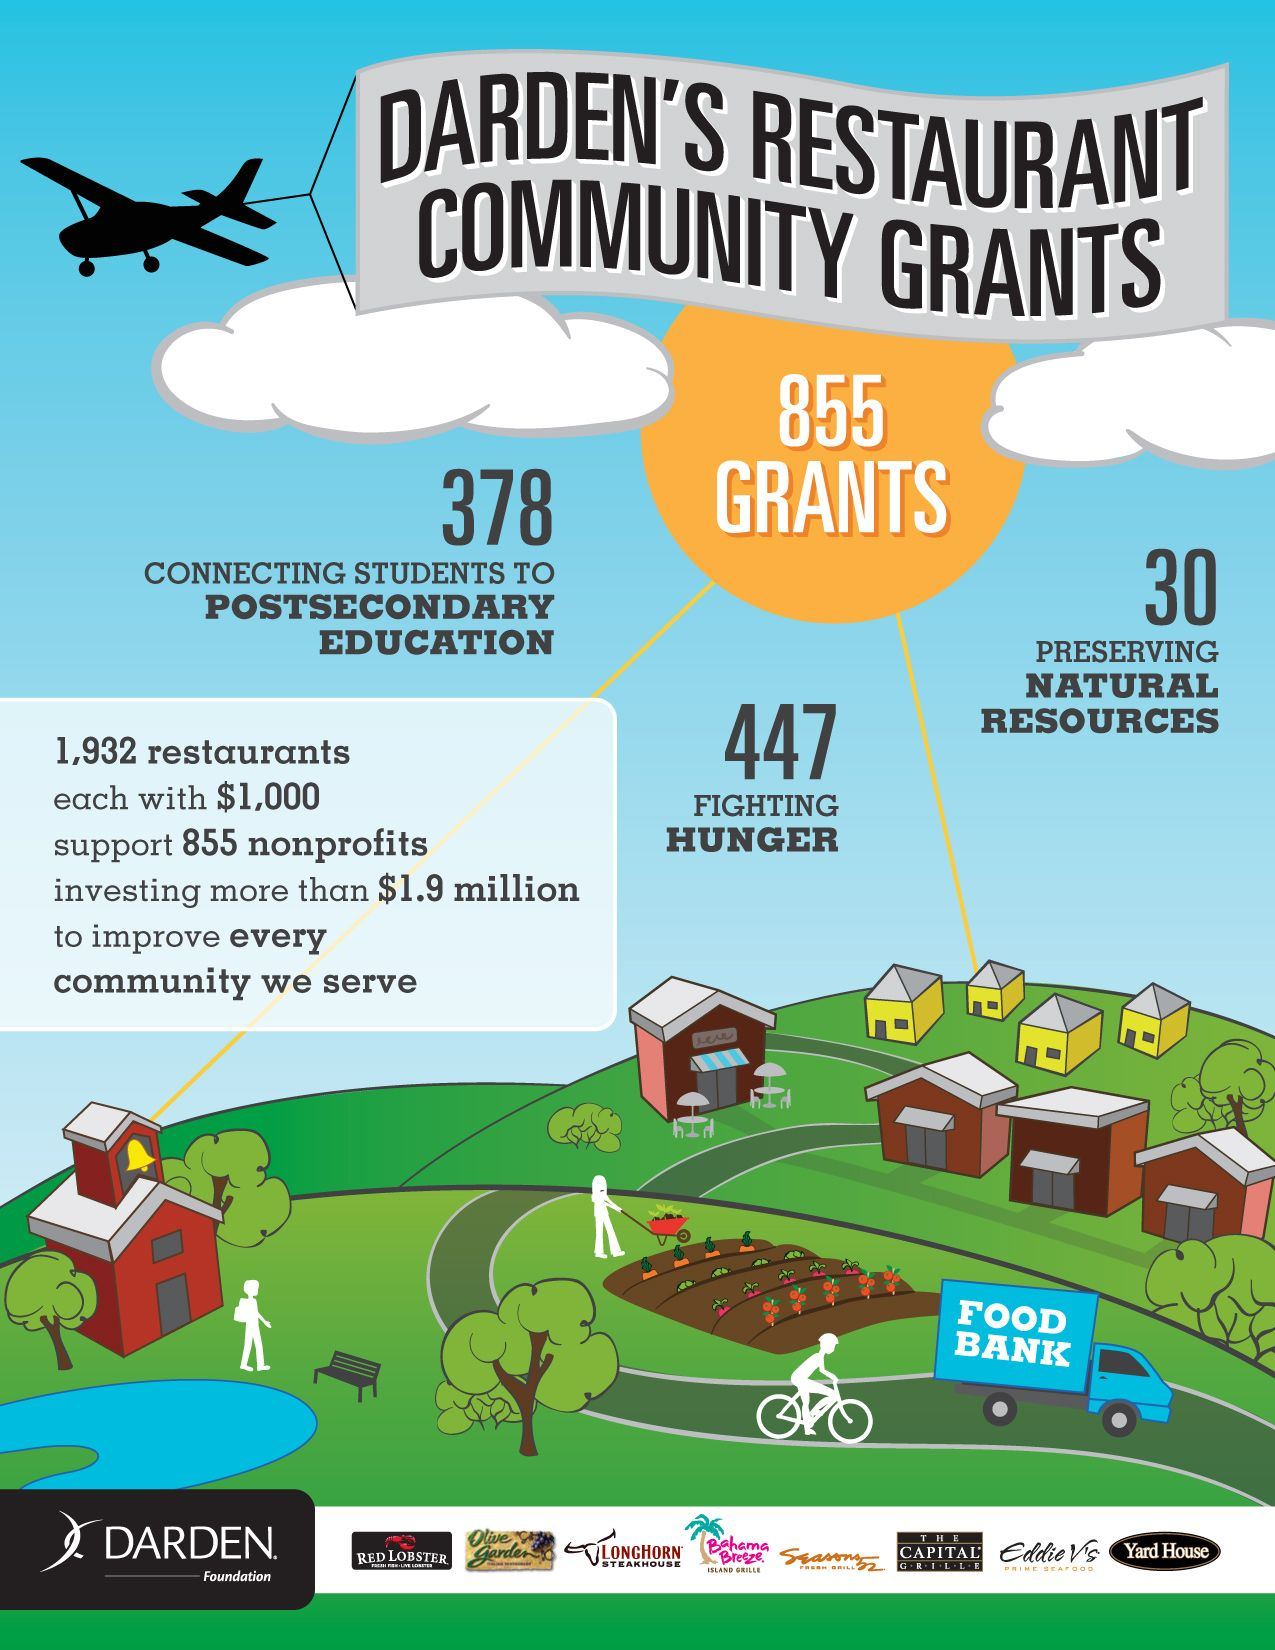 Darden's restaurant community grants infographic